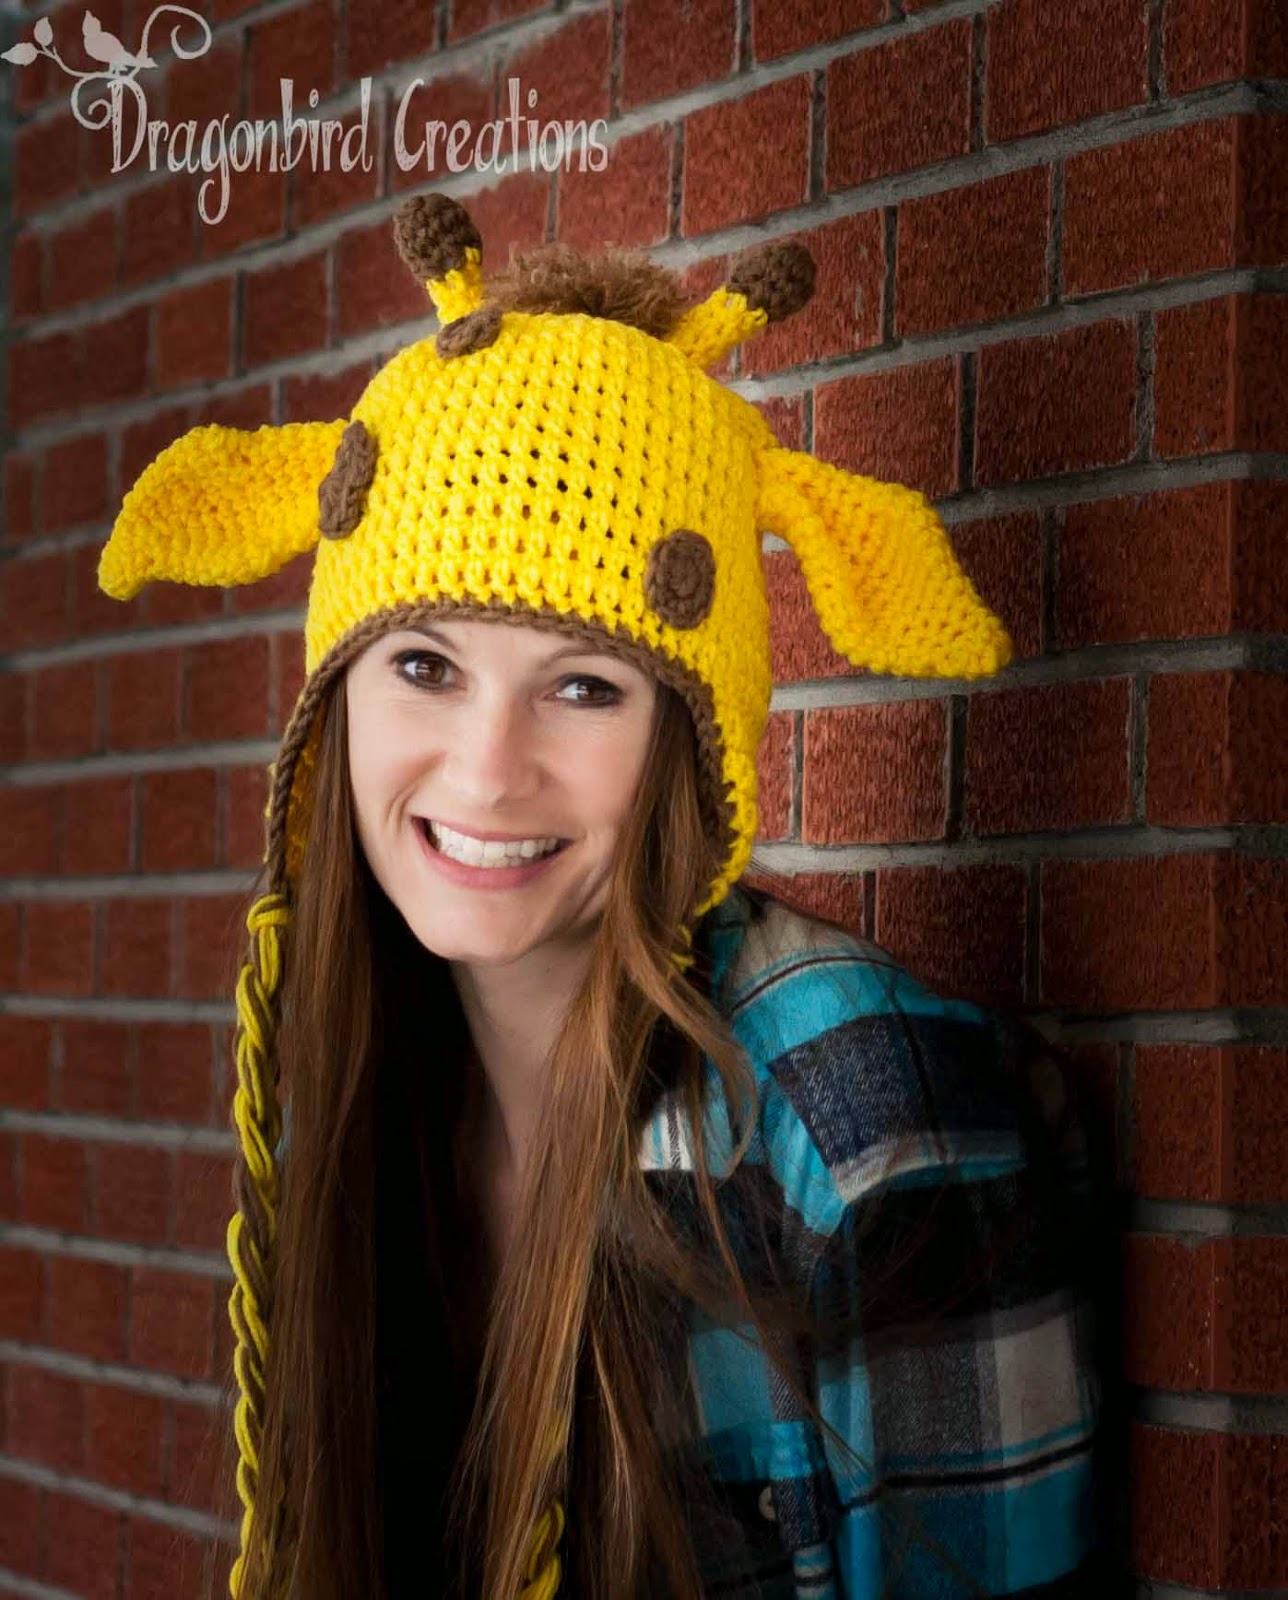 Free Crochet Pattern Giraffe Hat : Dragonbird Creations: Adventures in Crafts: Unpsychotic ...